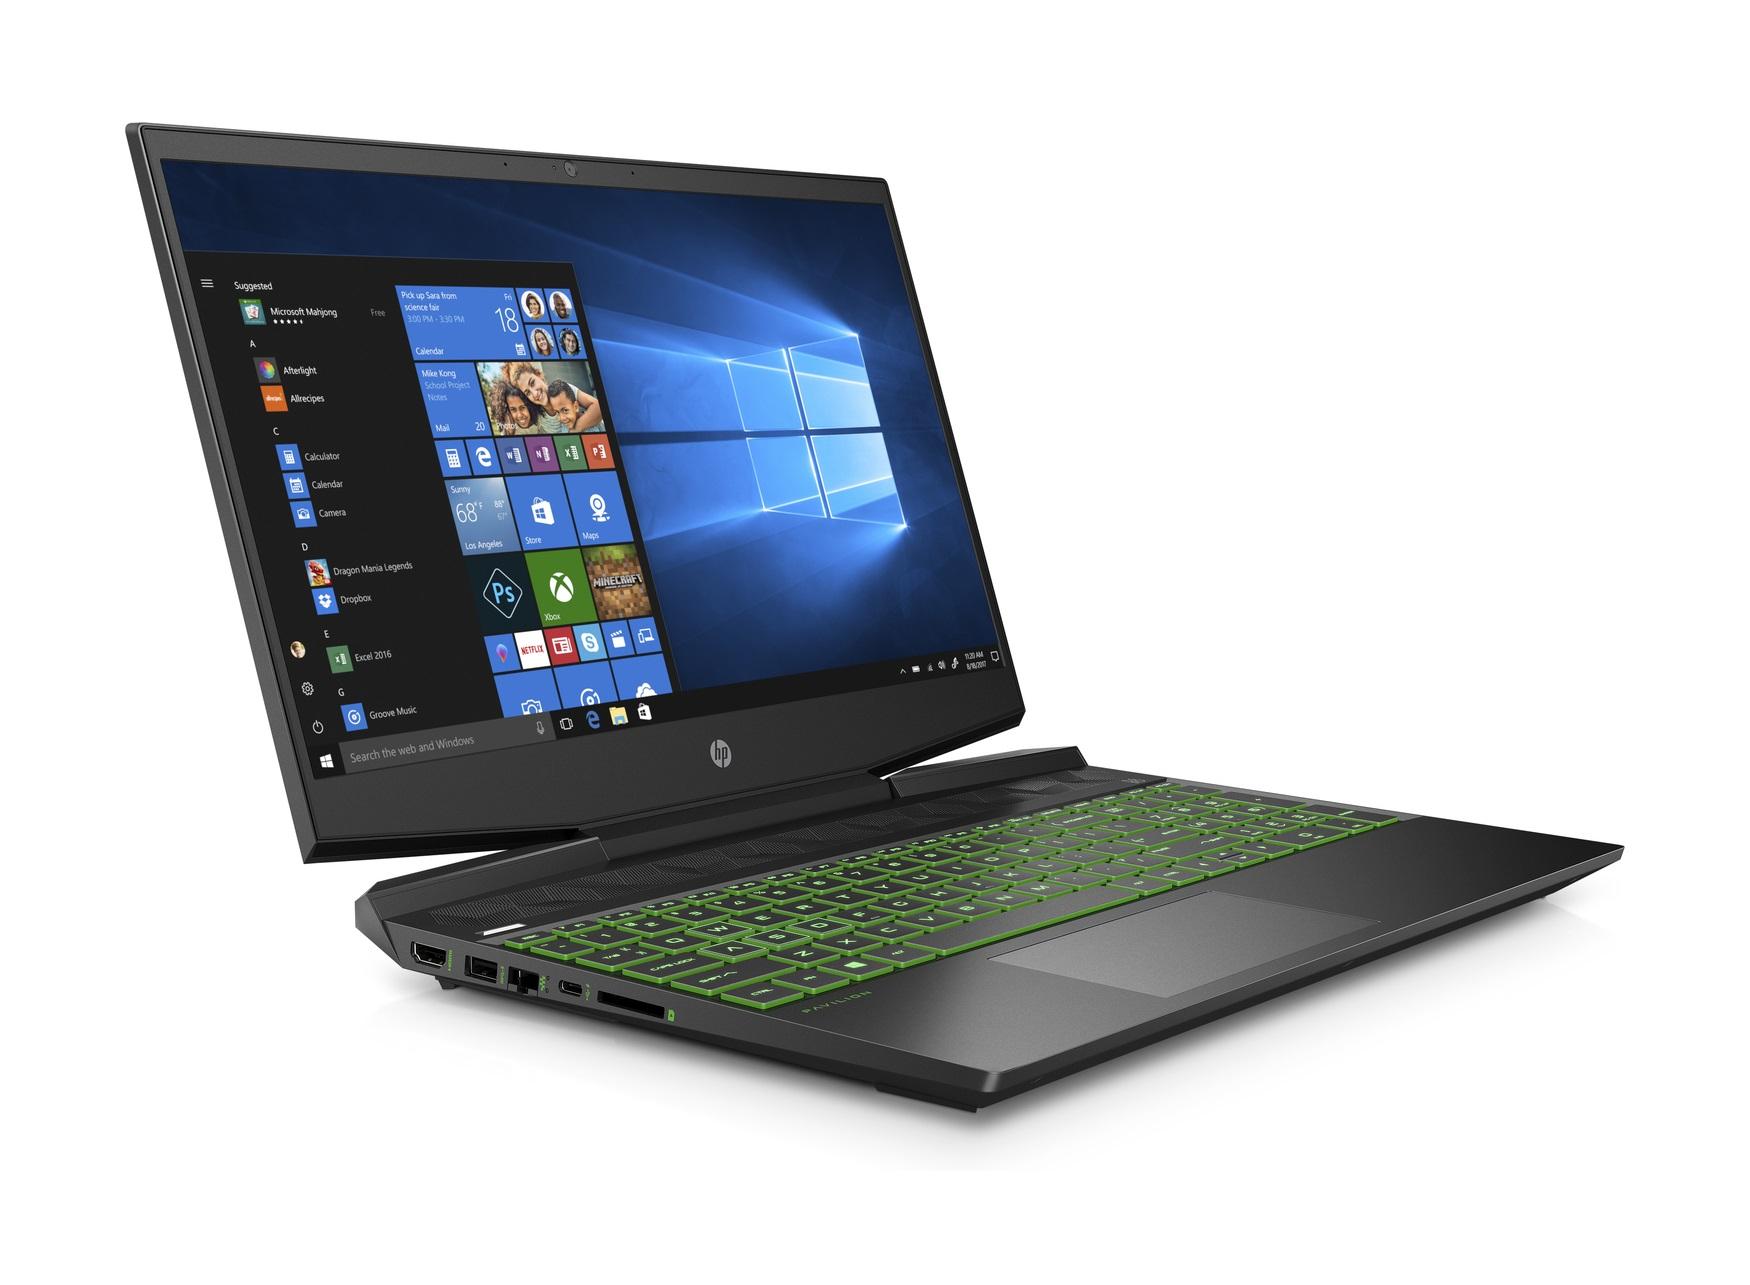 "PC Portable 15.6"" HP Pavilion Gaming 15-dk1017nf - FHD, i5-10300H, 8 Go RAM, 1 To HDD + 256 Go SSD, GTX 1660 Ti, Windows 10"